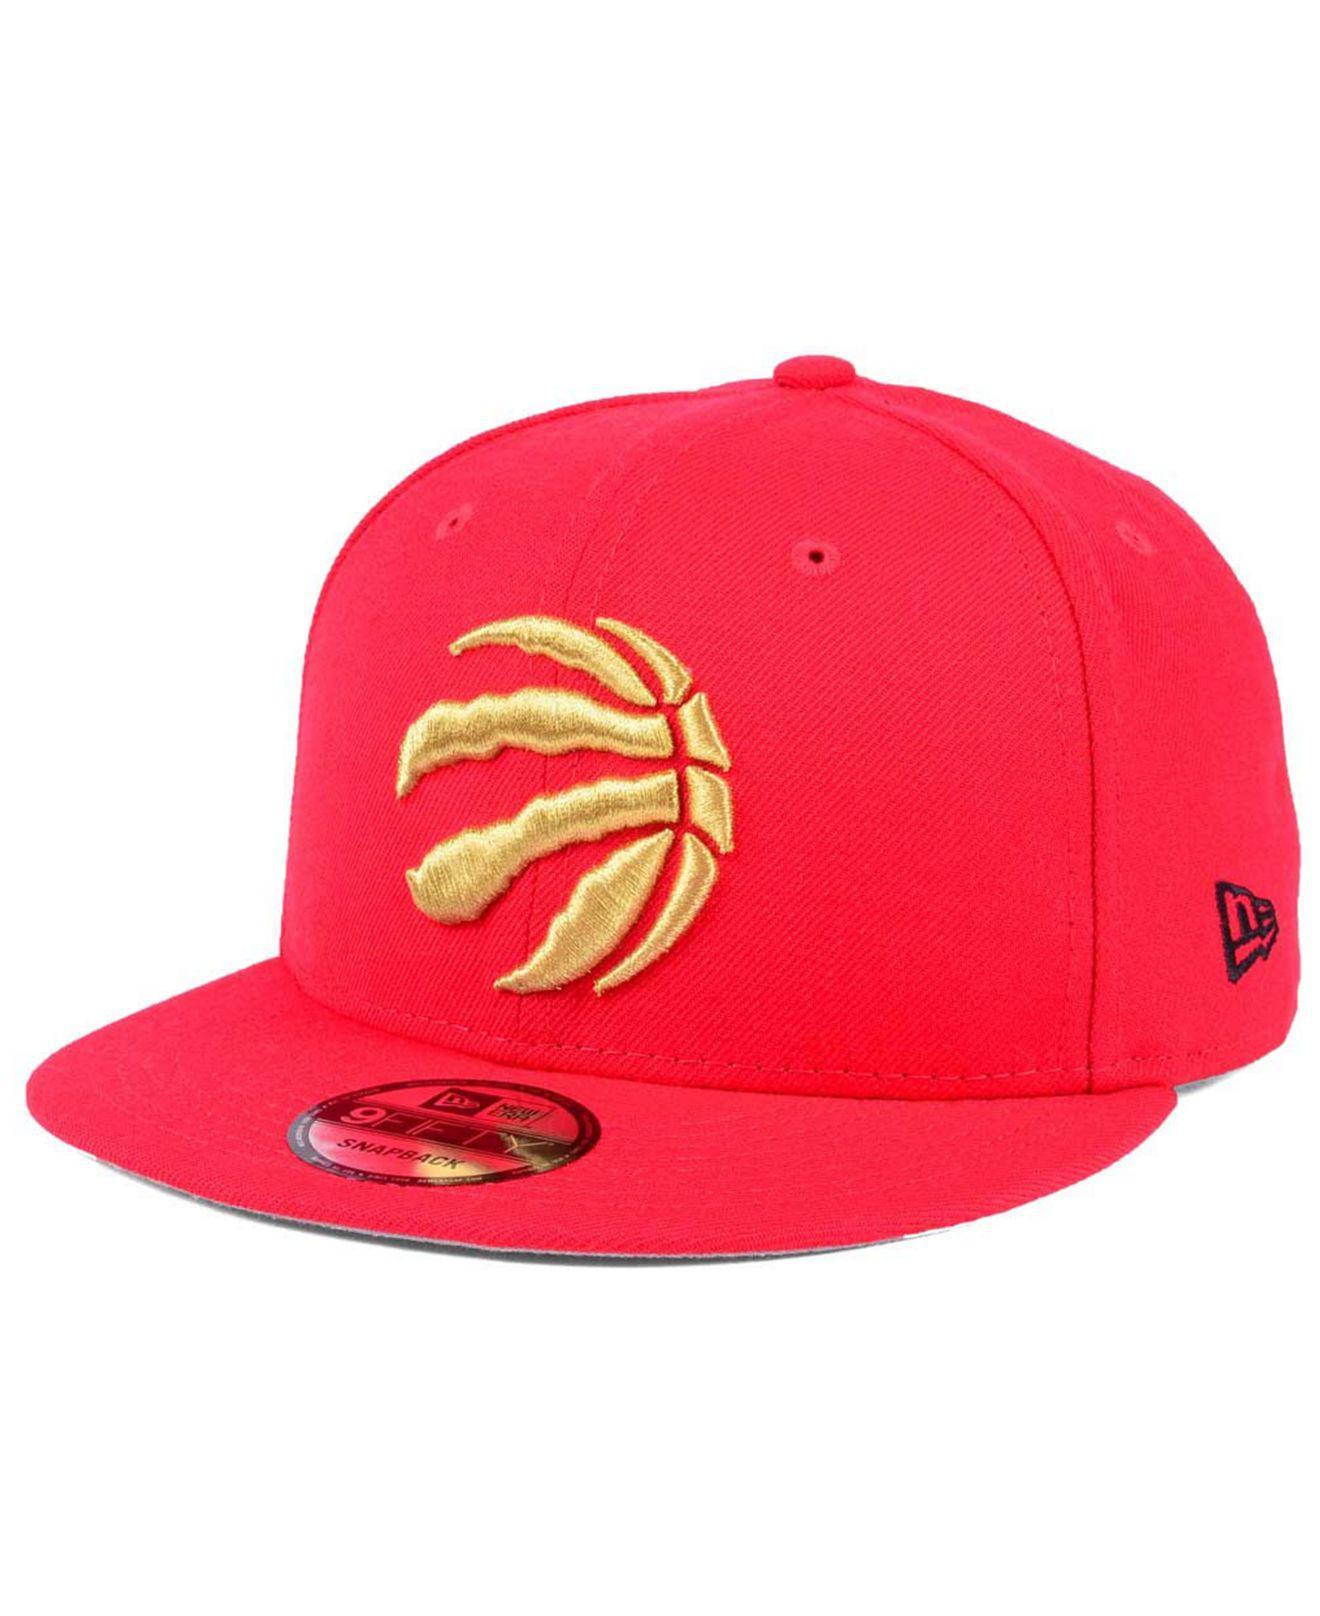 best website a0881 f91f3 ... store lyst ktz toronto raptors solid alternate 9fifty snapback cap in  1e25e 3c69f